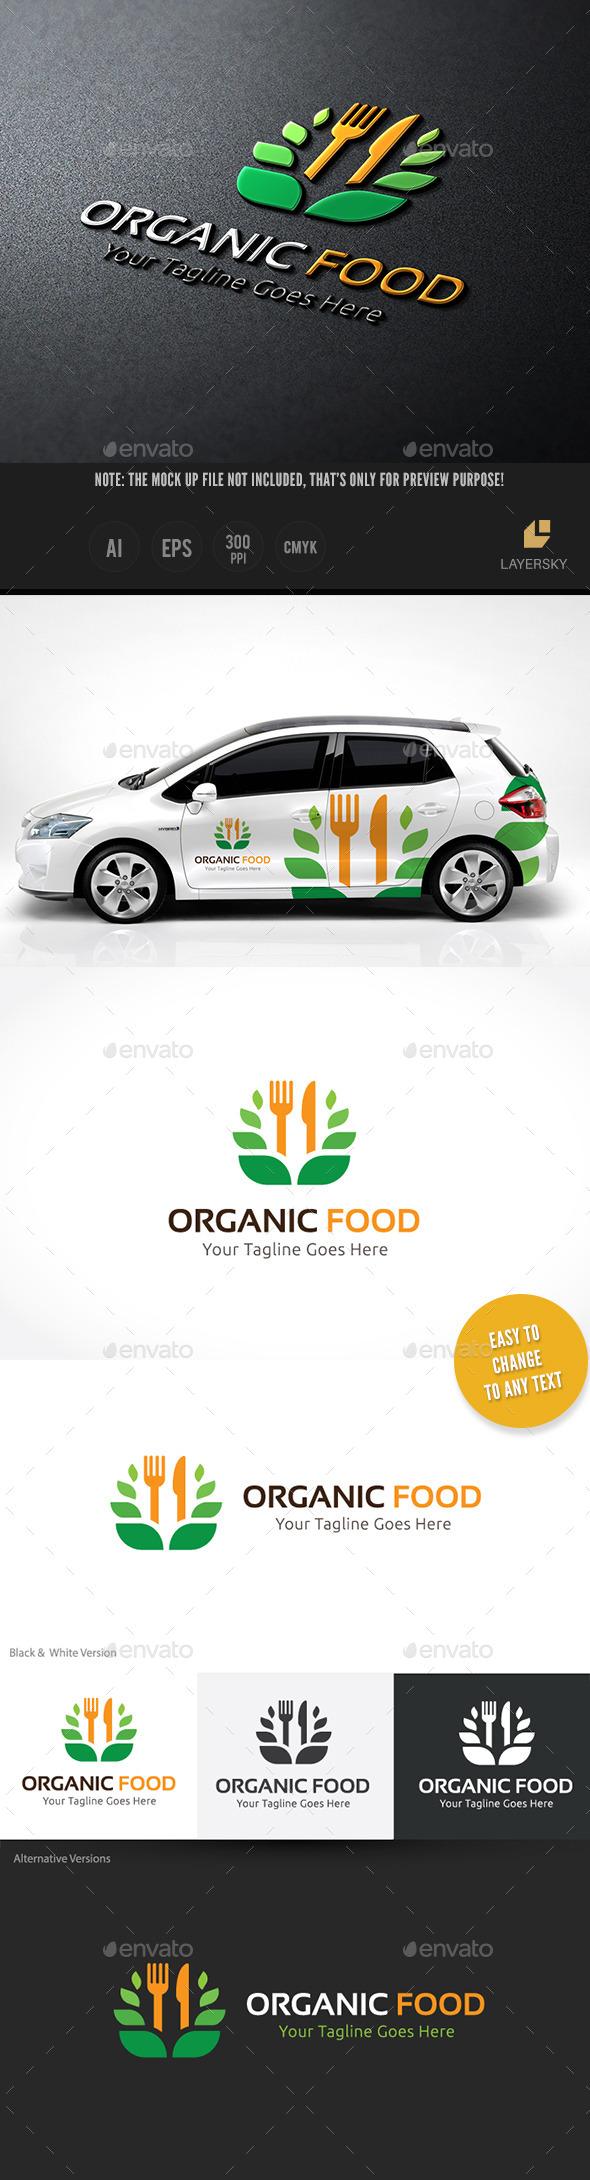 Organic Food - Food Logo Templates